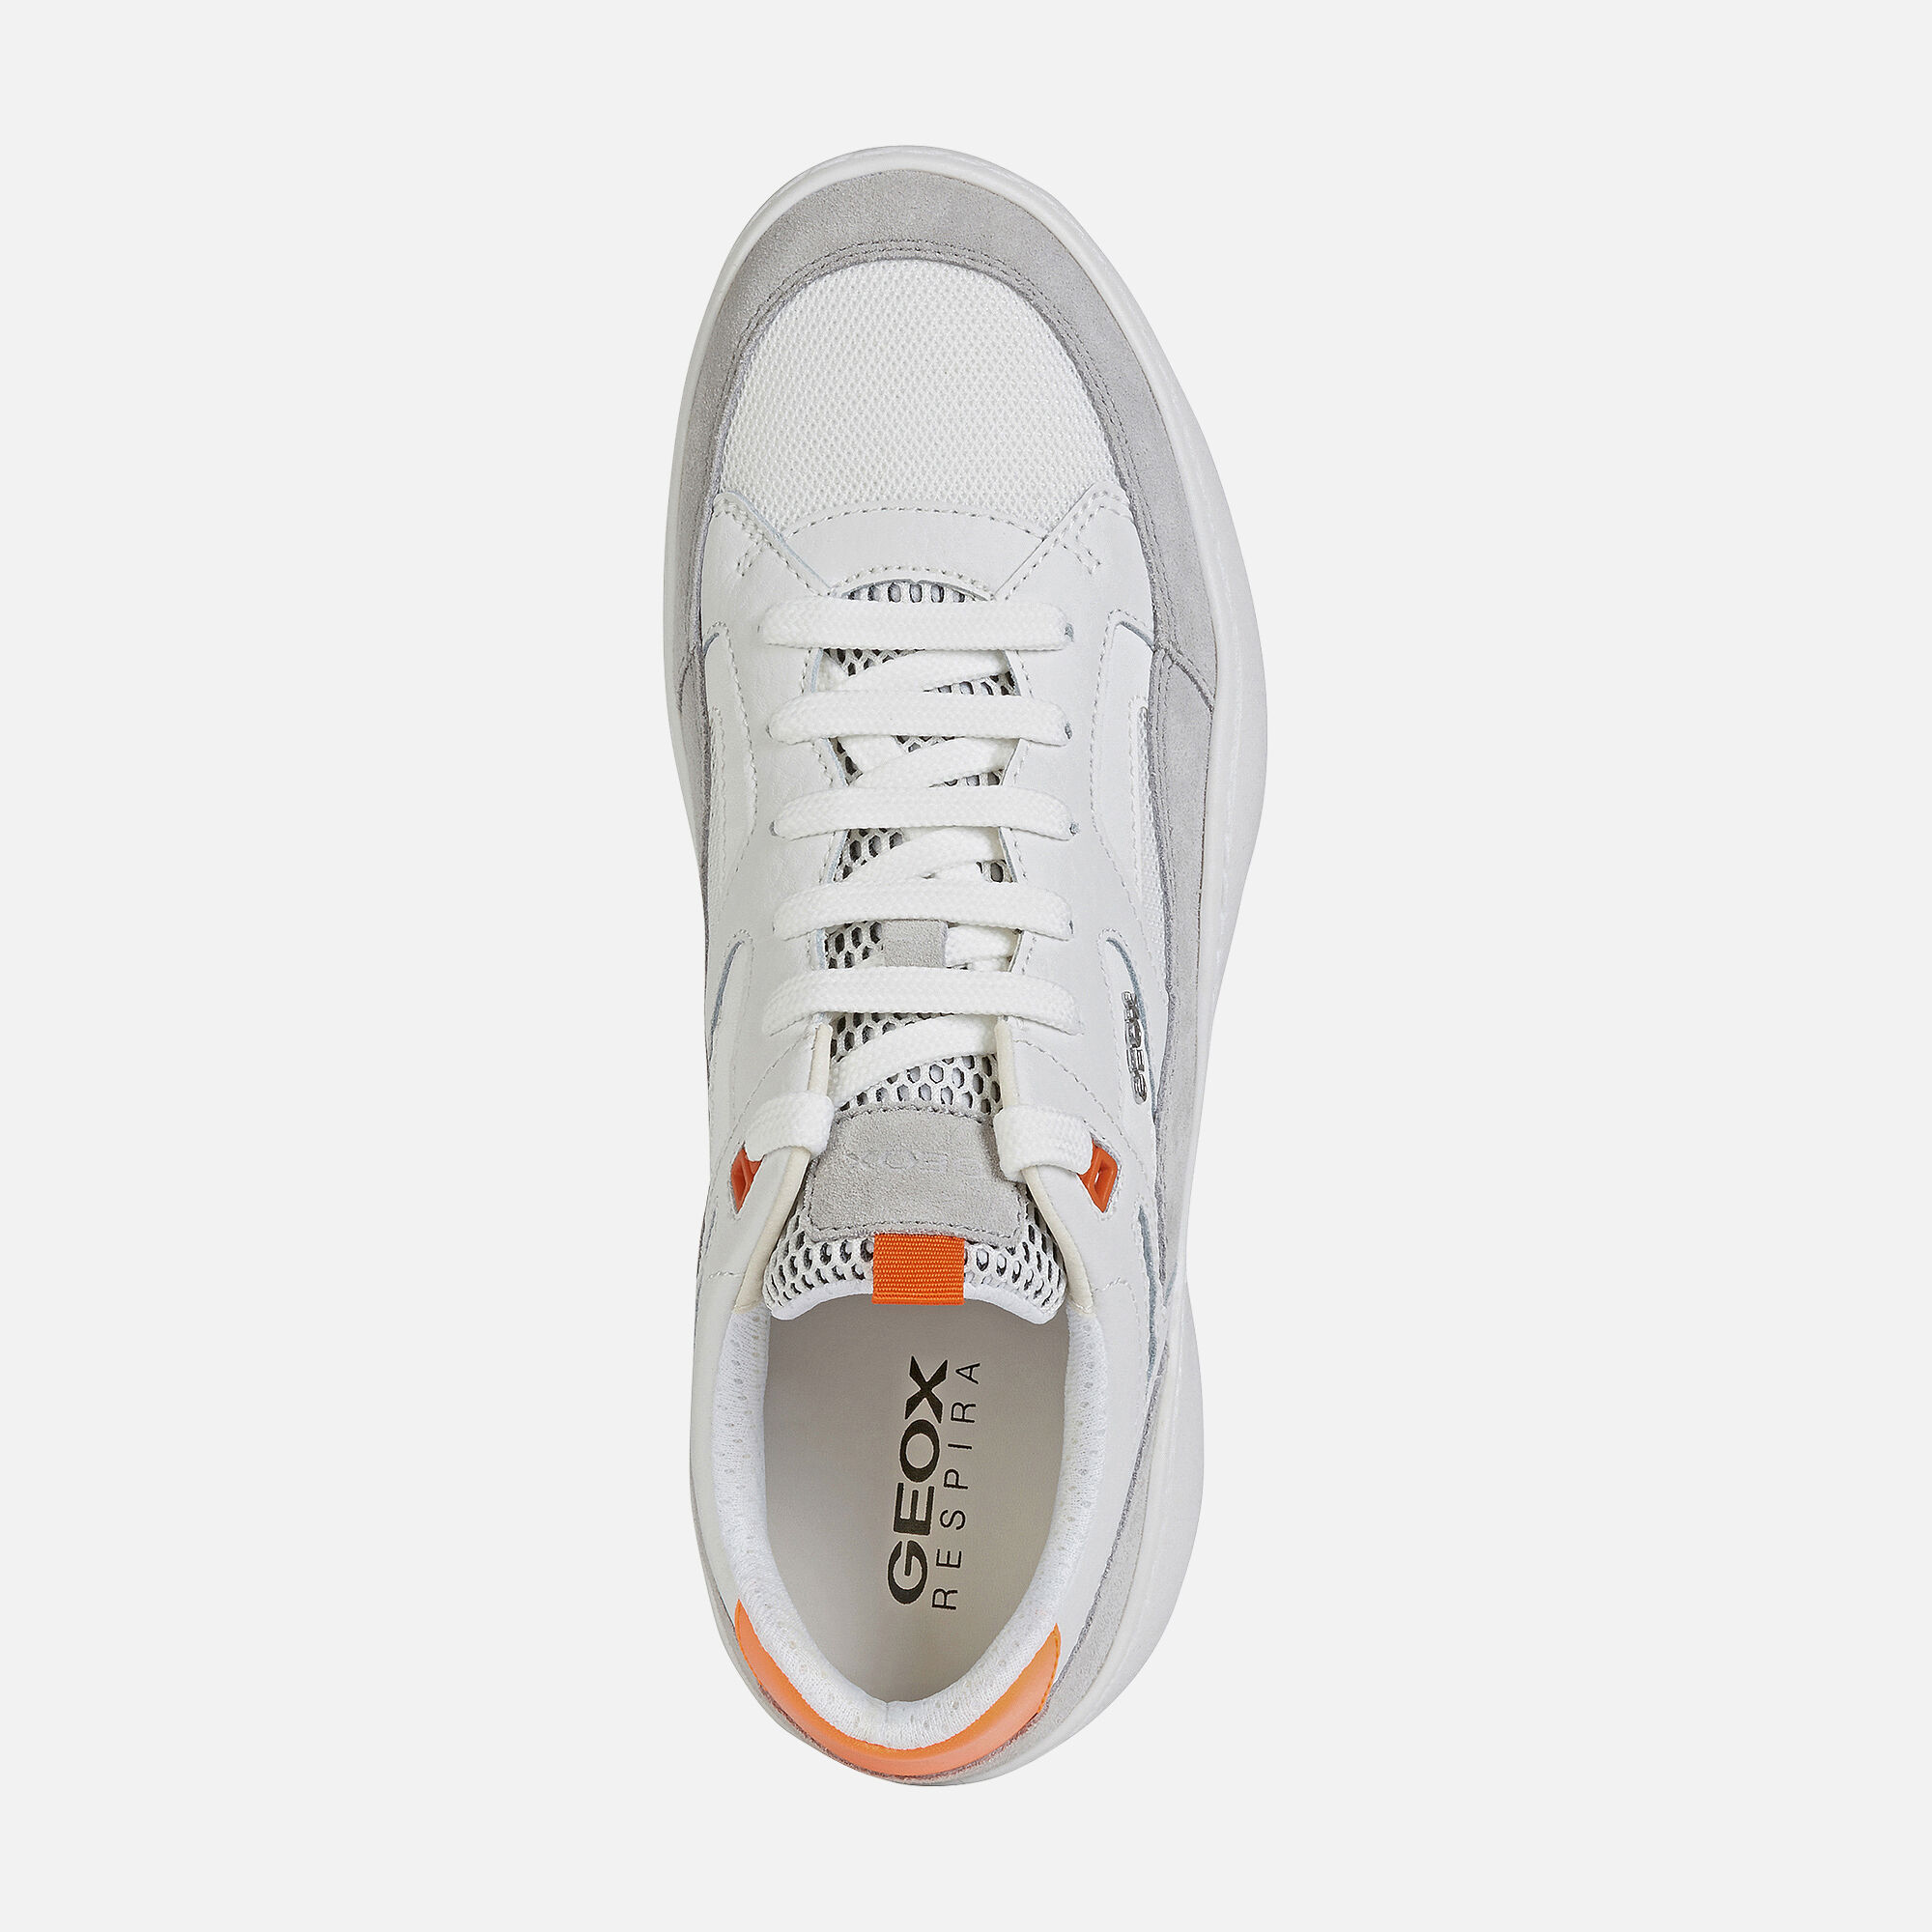 Geox COLBYN Man: Light grey Sneakers